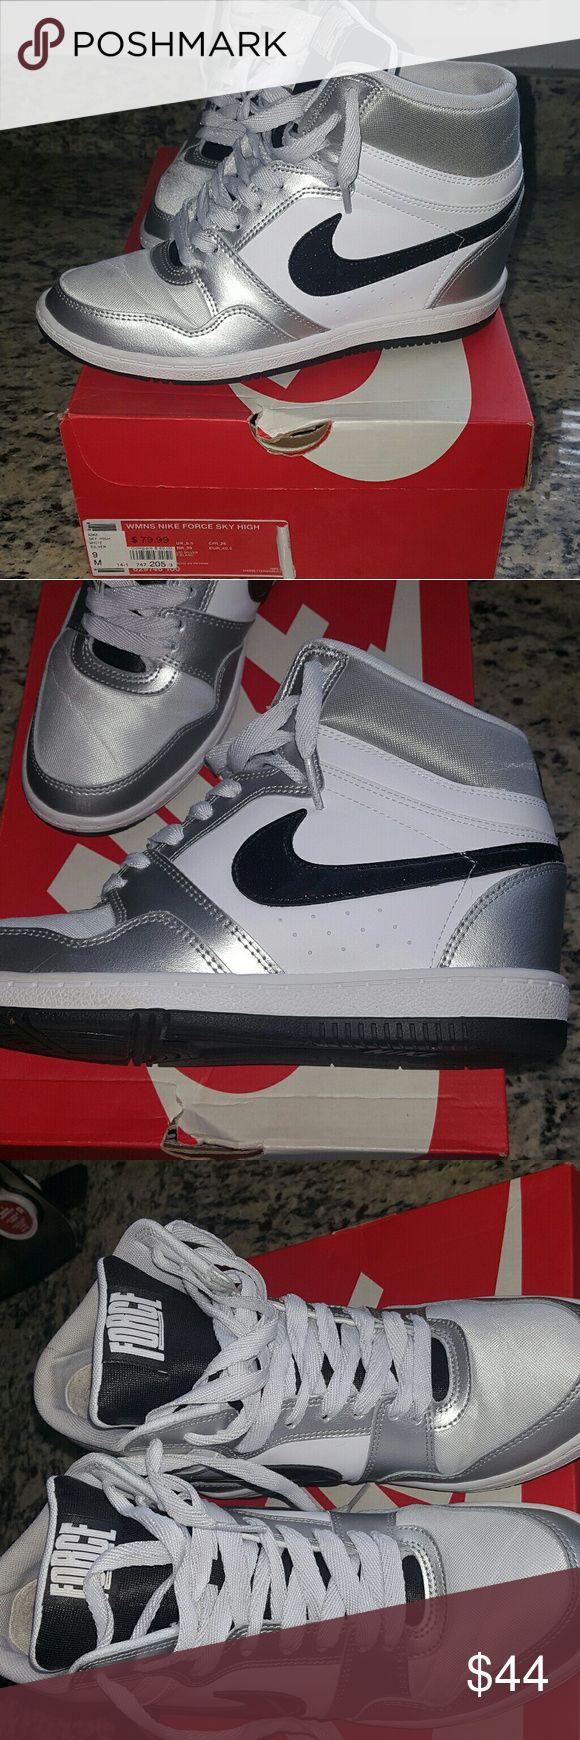 Nike Force Sky Wedge Sneakers Nike Wedge Sneakers, White, silver and black Nike Shoes Sneakers